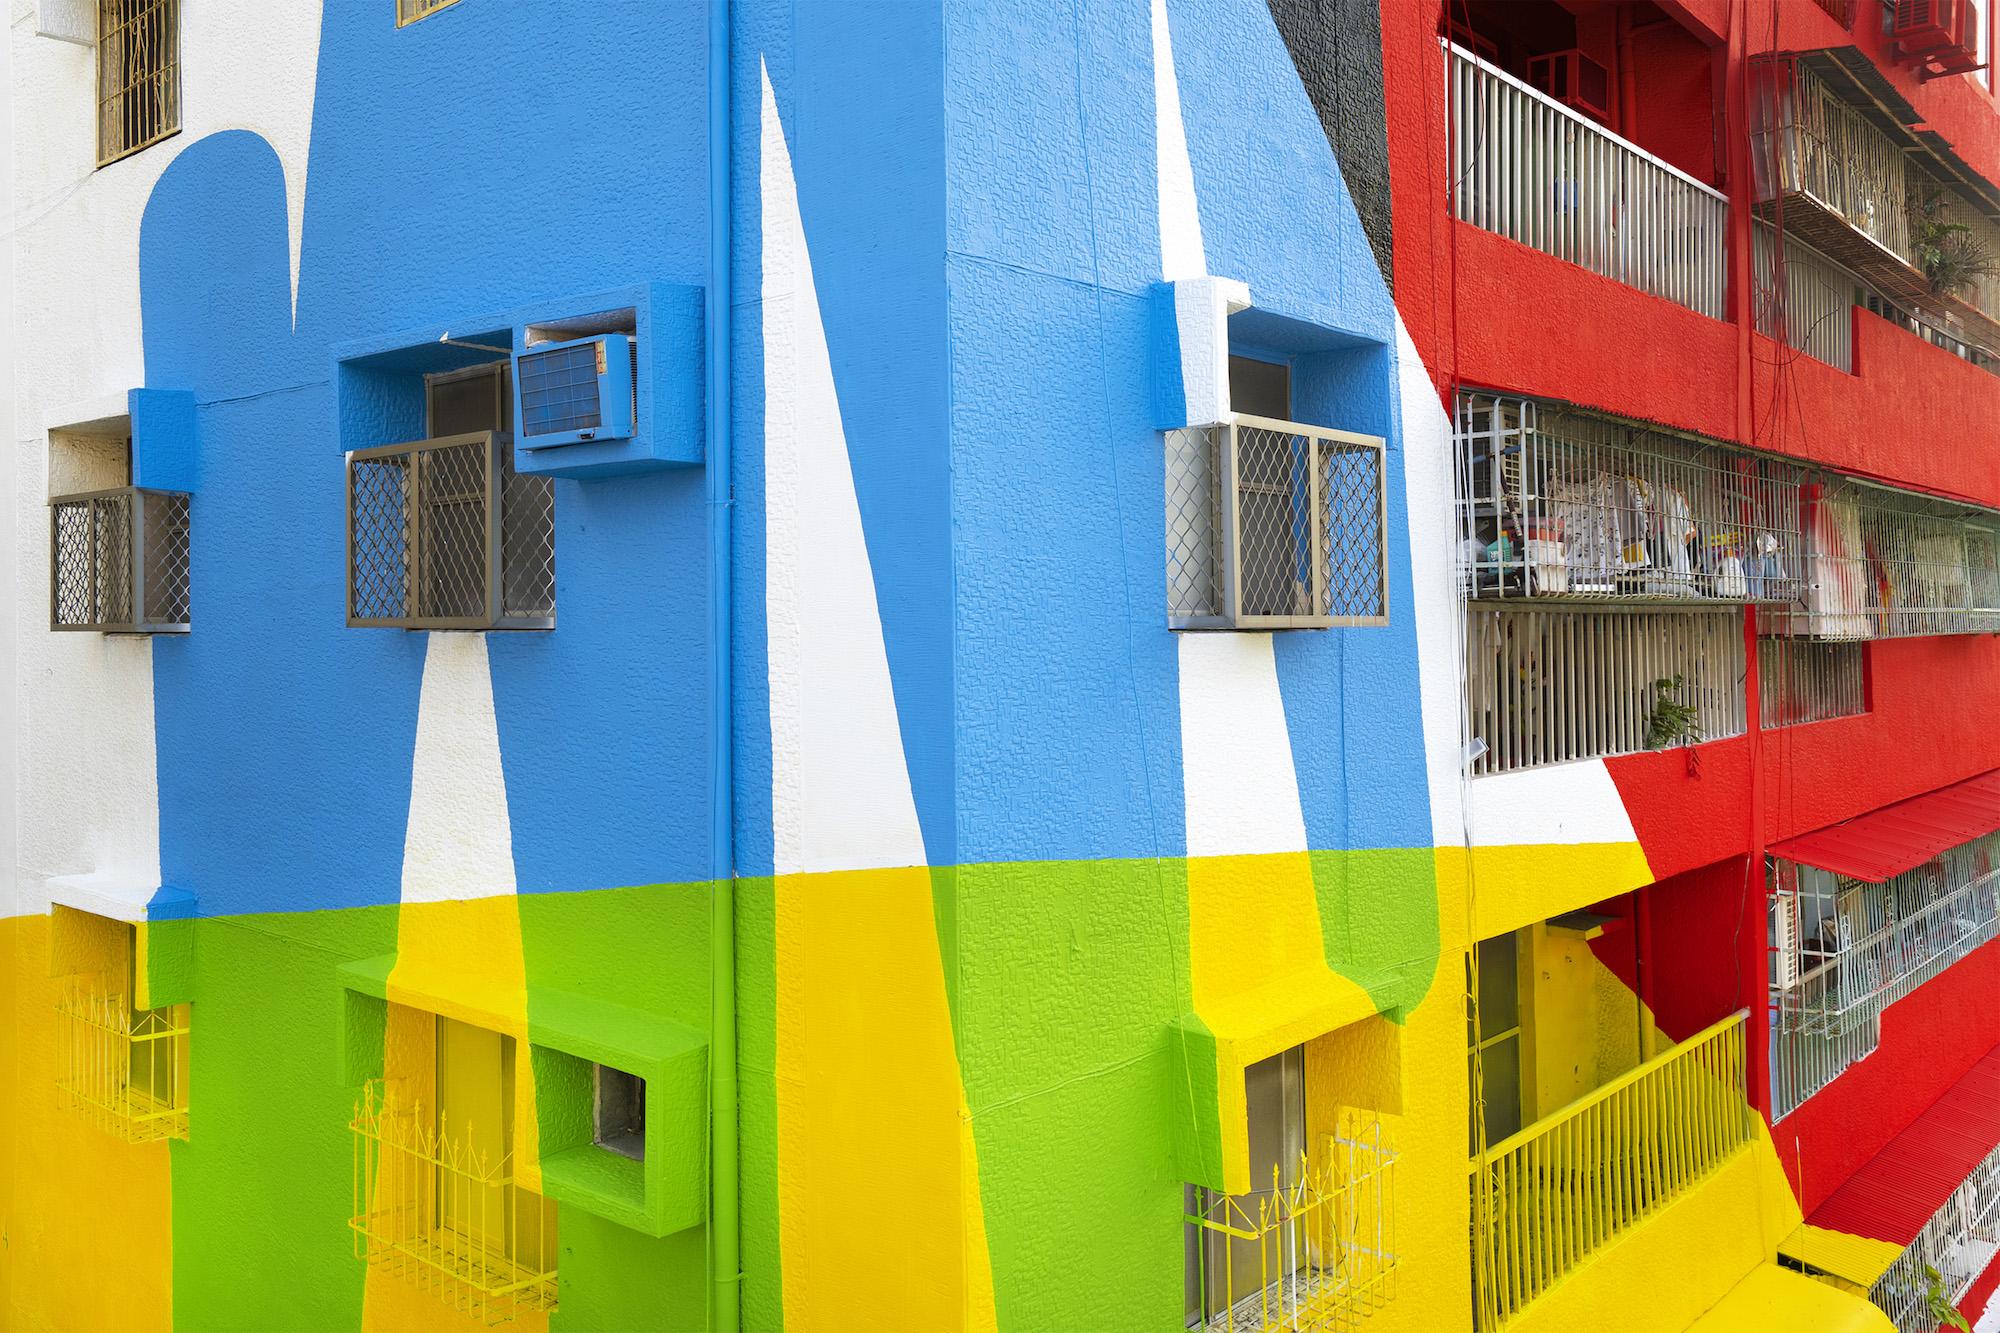 Novos trabalhos de Elian Chali na Argentina, EUA, e Taiwan Artes & contextos Sewing Corner Kaohsiung TW  Elian Chali LQ 3